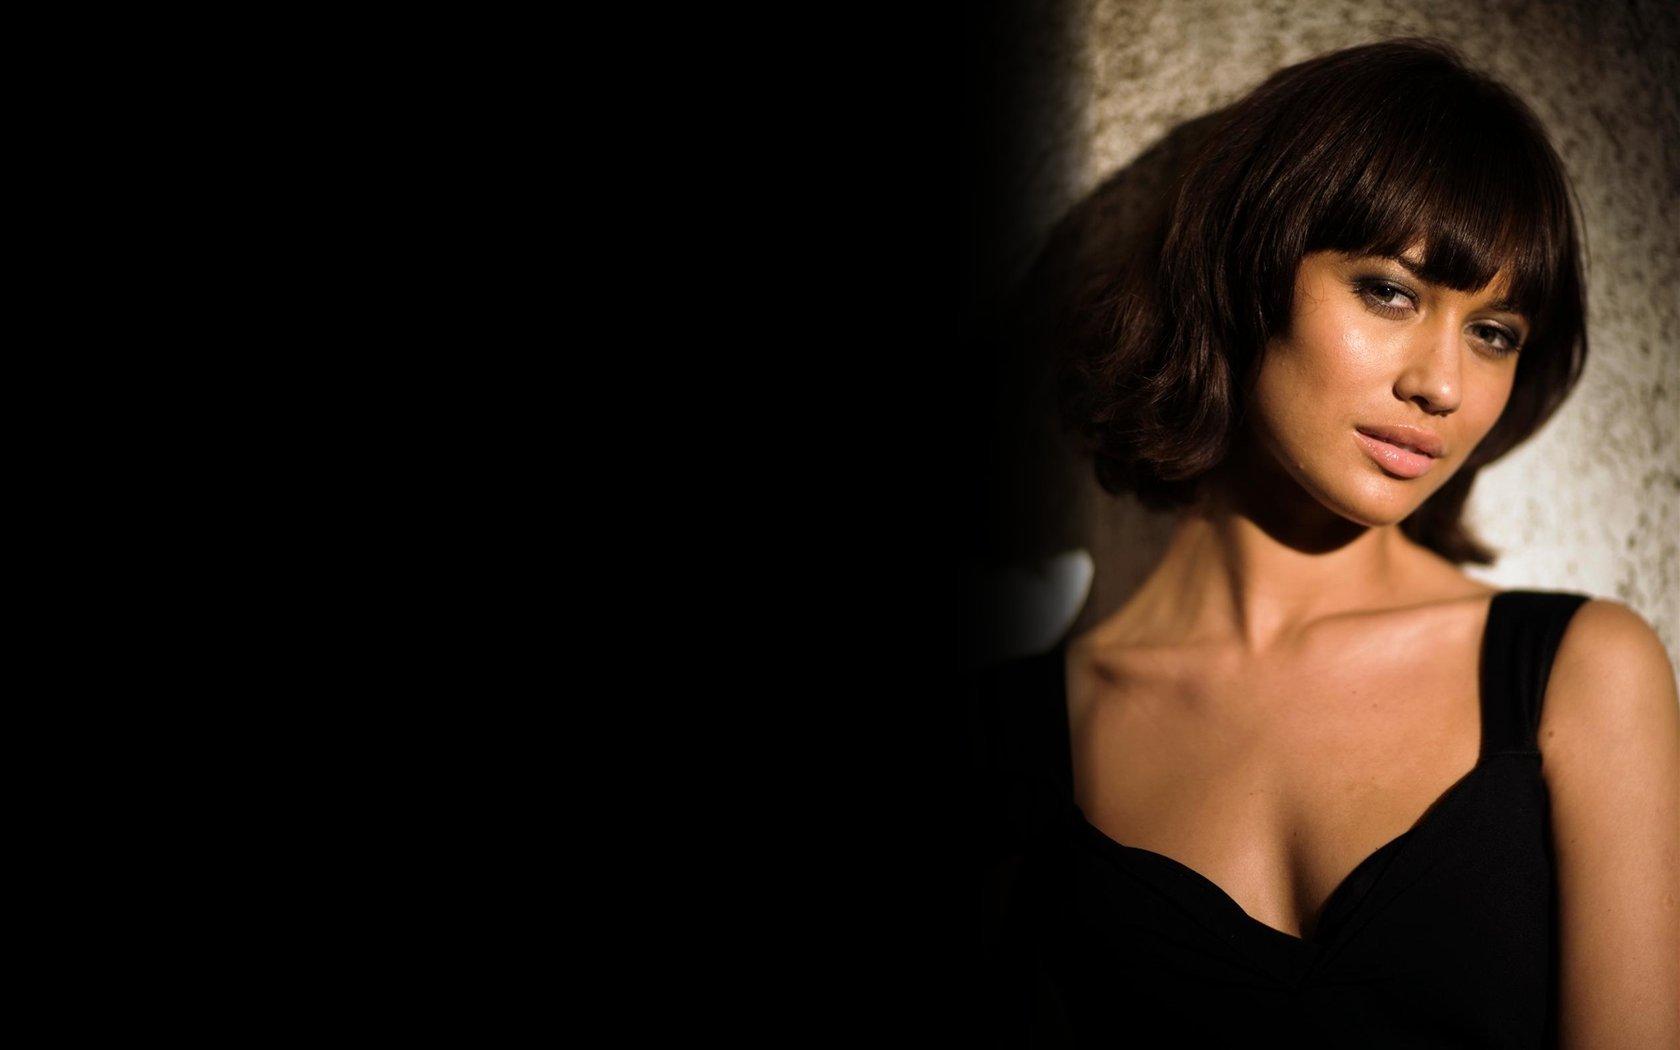 Olga Kurylenko 'Quantum of Solace' Widescreen fond d'écran